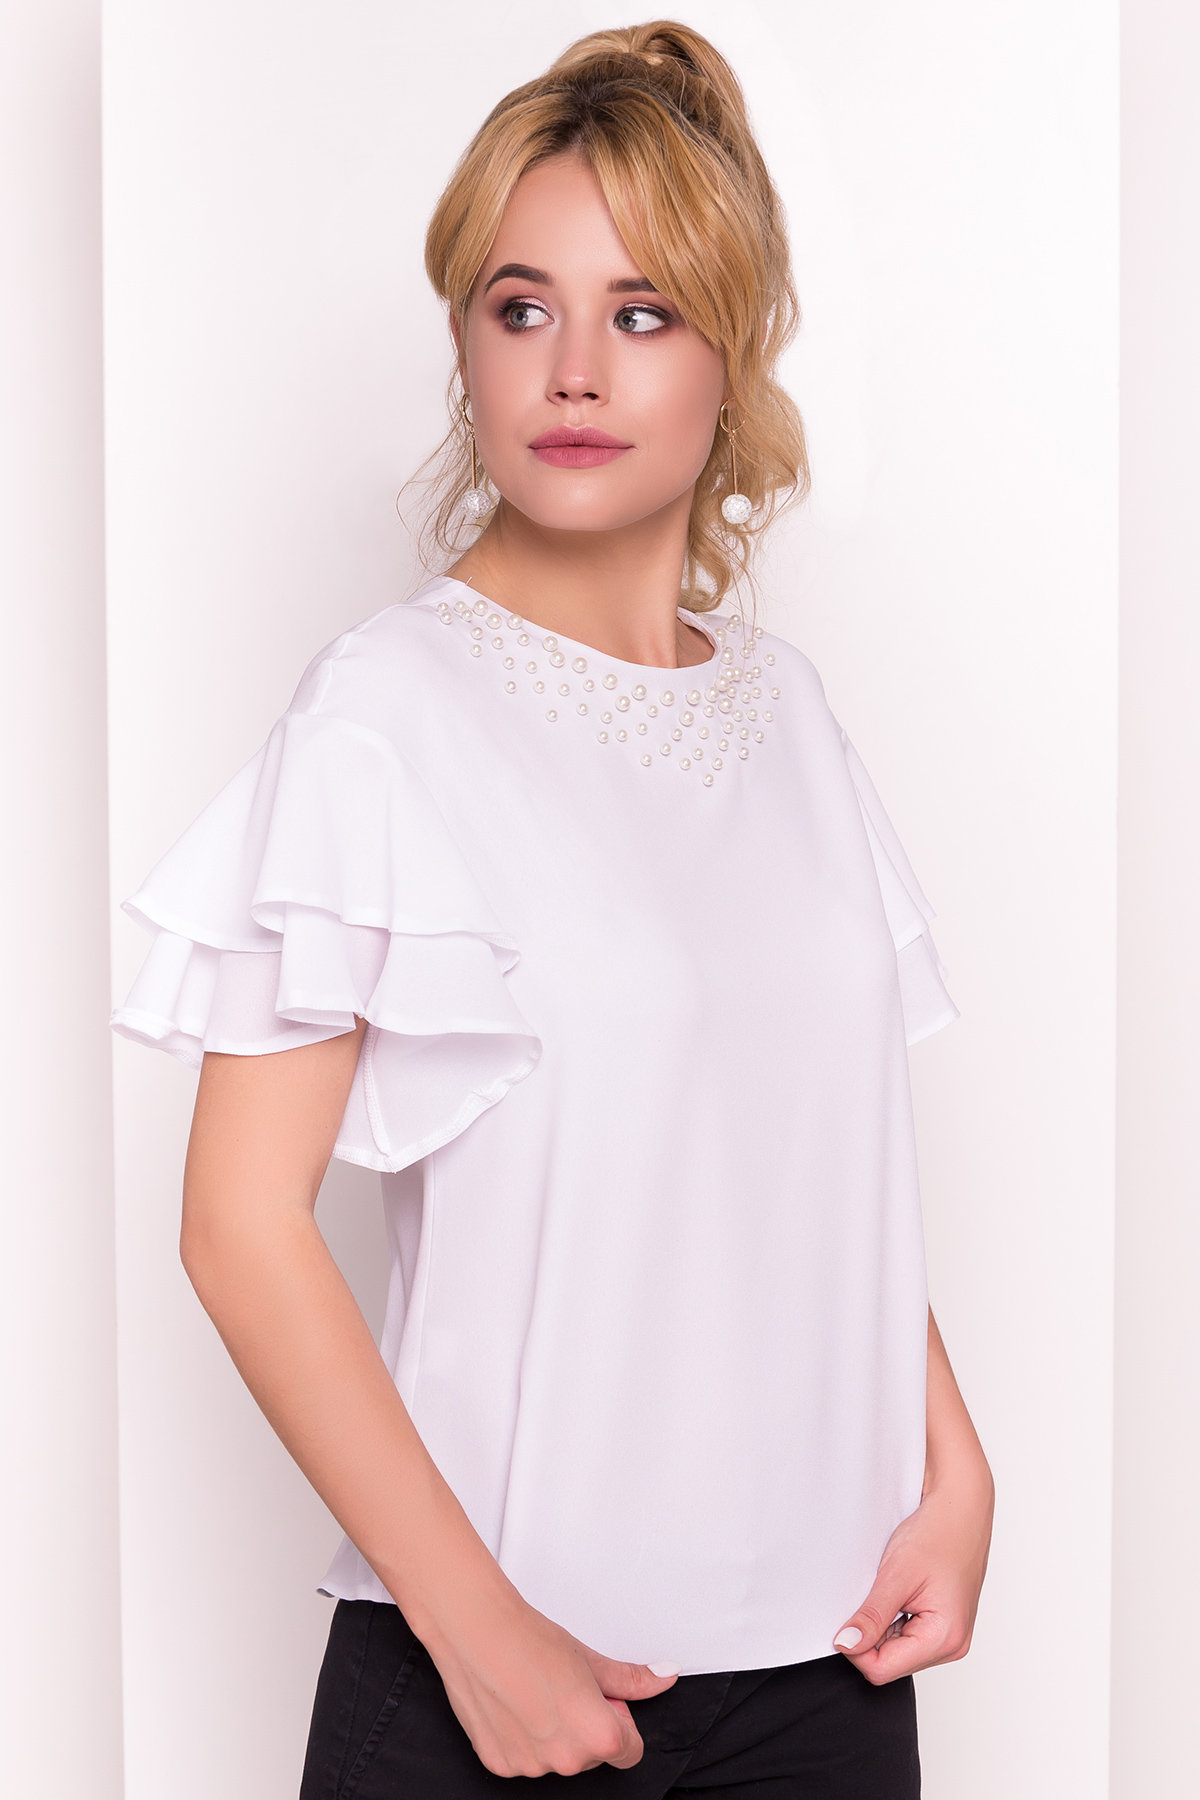 Блуза Мария 4882 АРТ. 35800 Цвет: Белый - фото 2, интернет магазин tm-modus.ru